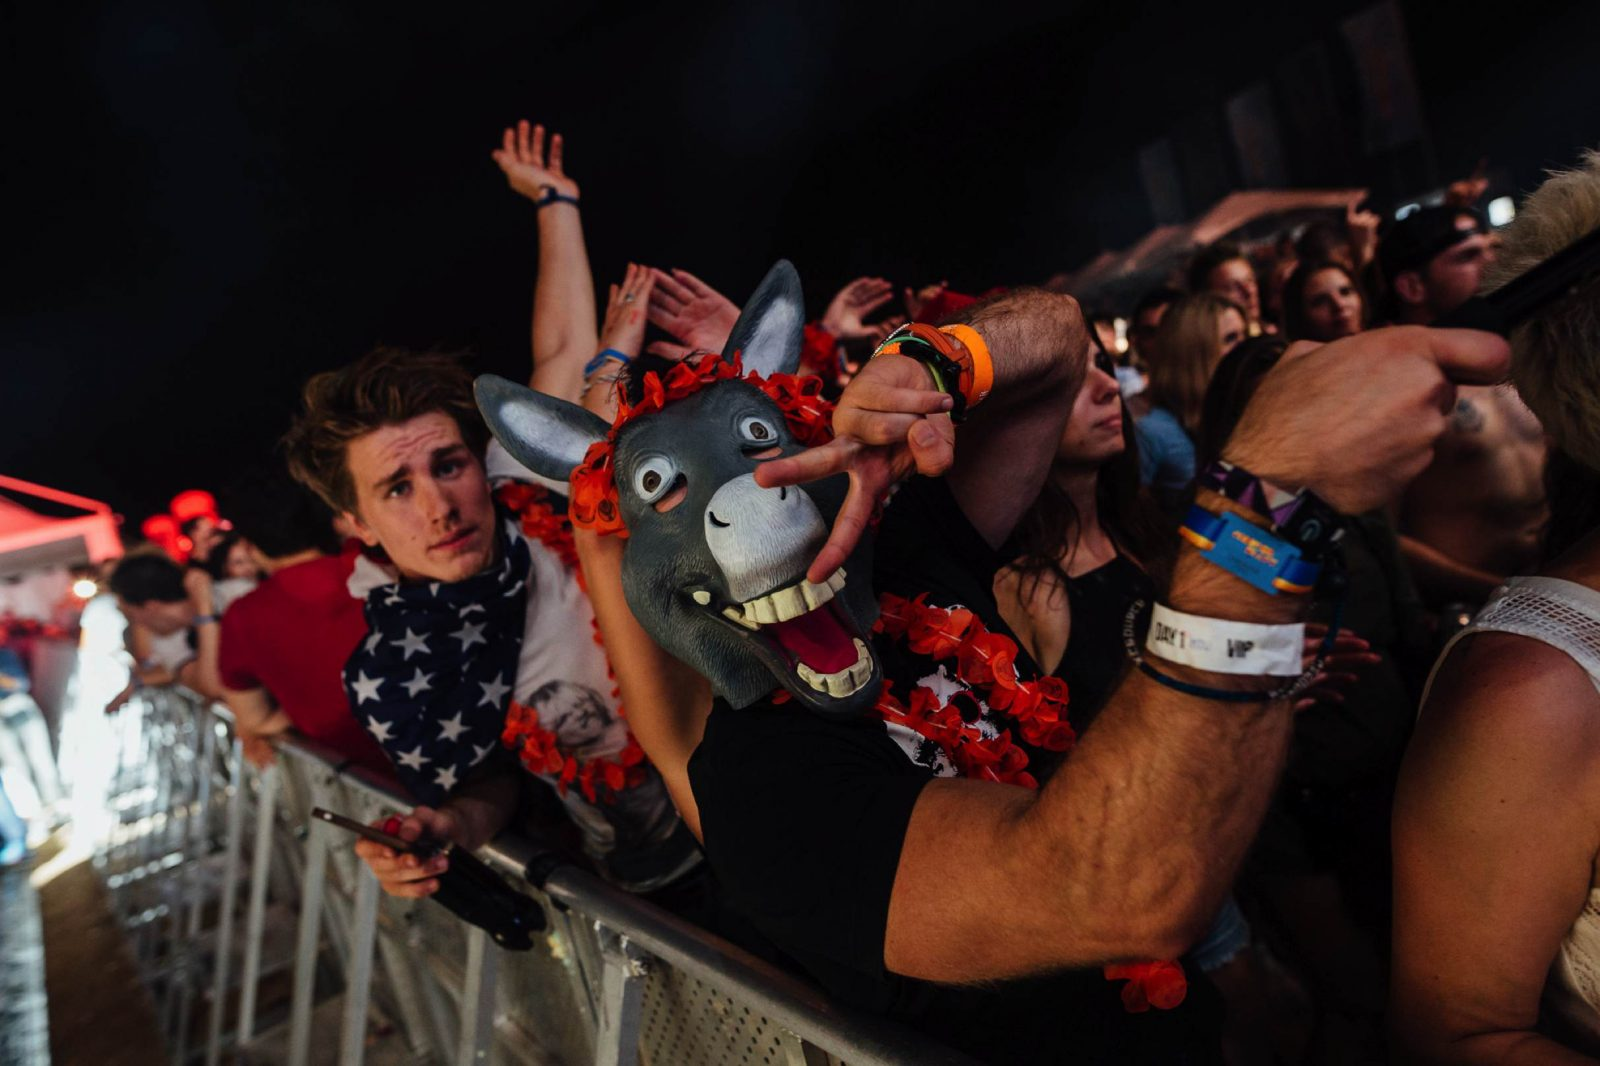 ZAVRŠEN PRVI  CLUB MTV SUMMERBLAST FESTIVAL